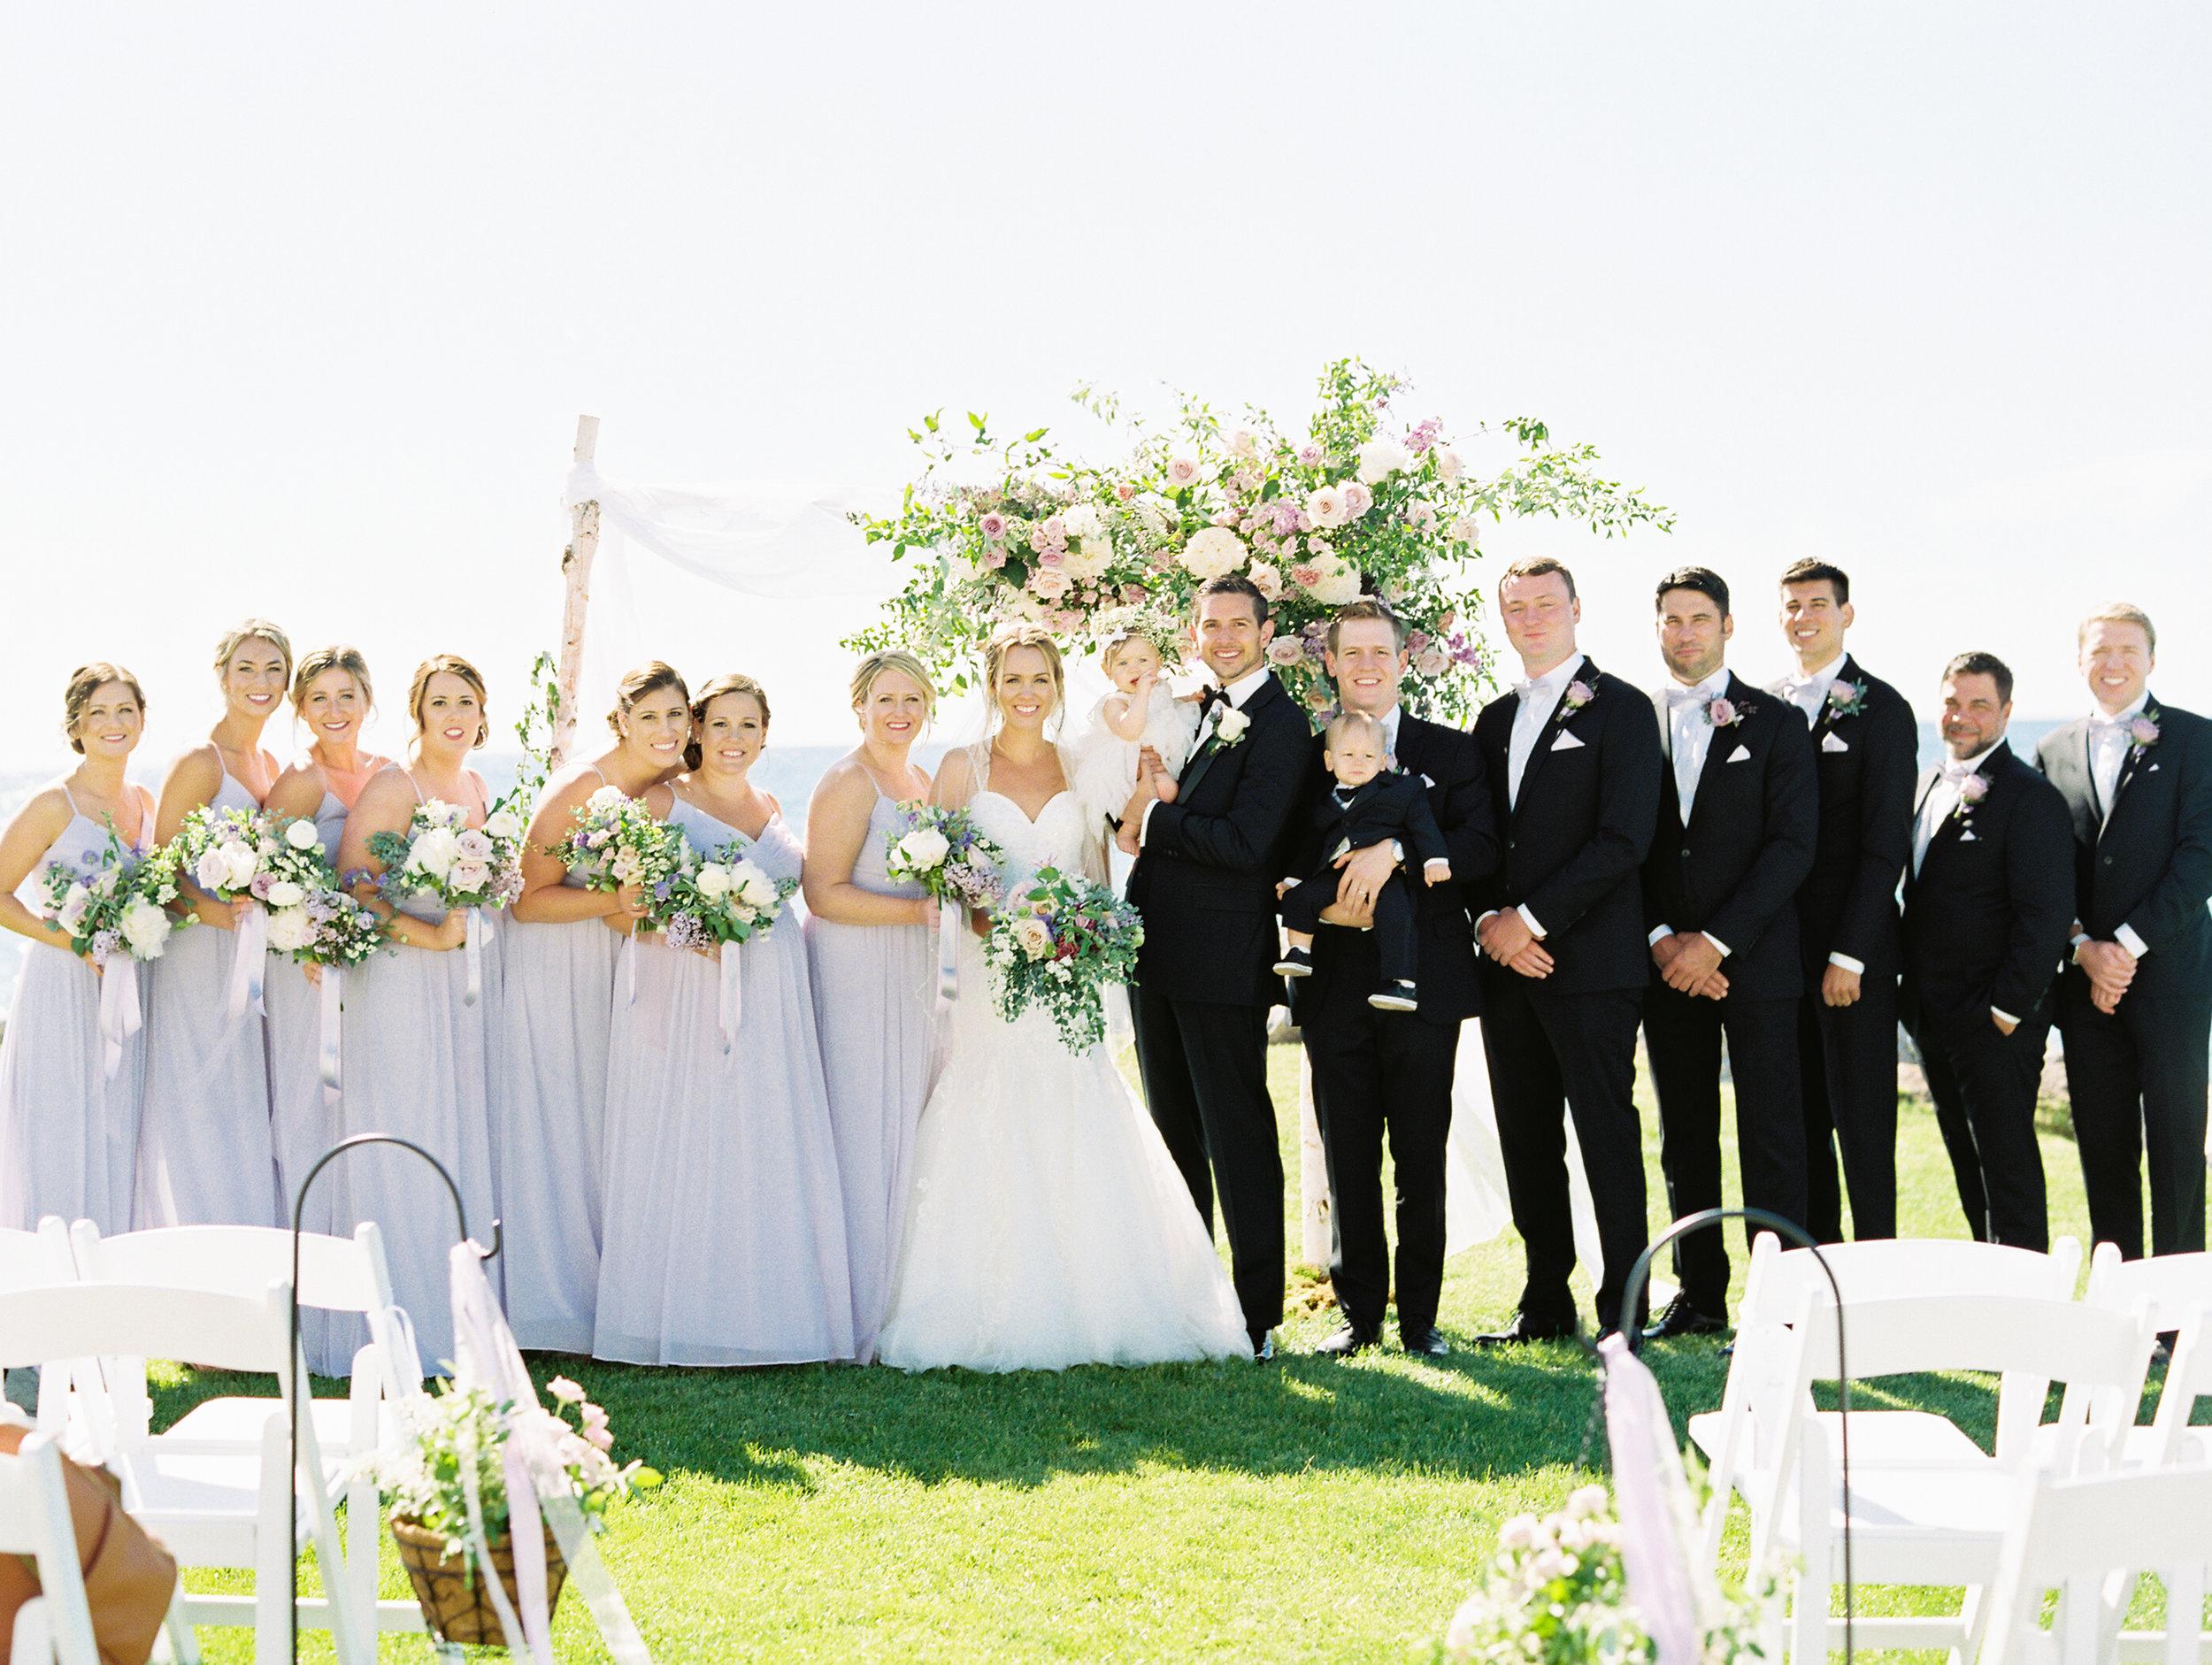 Noss+Wedding+Bridal+Party-24.jpg